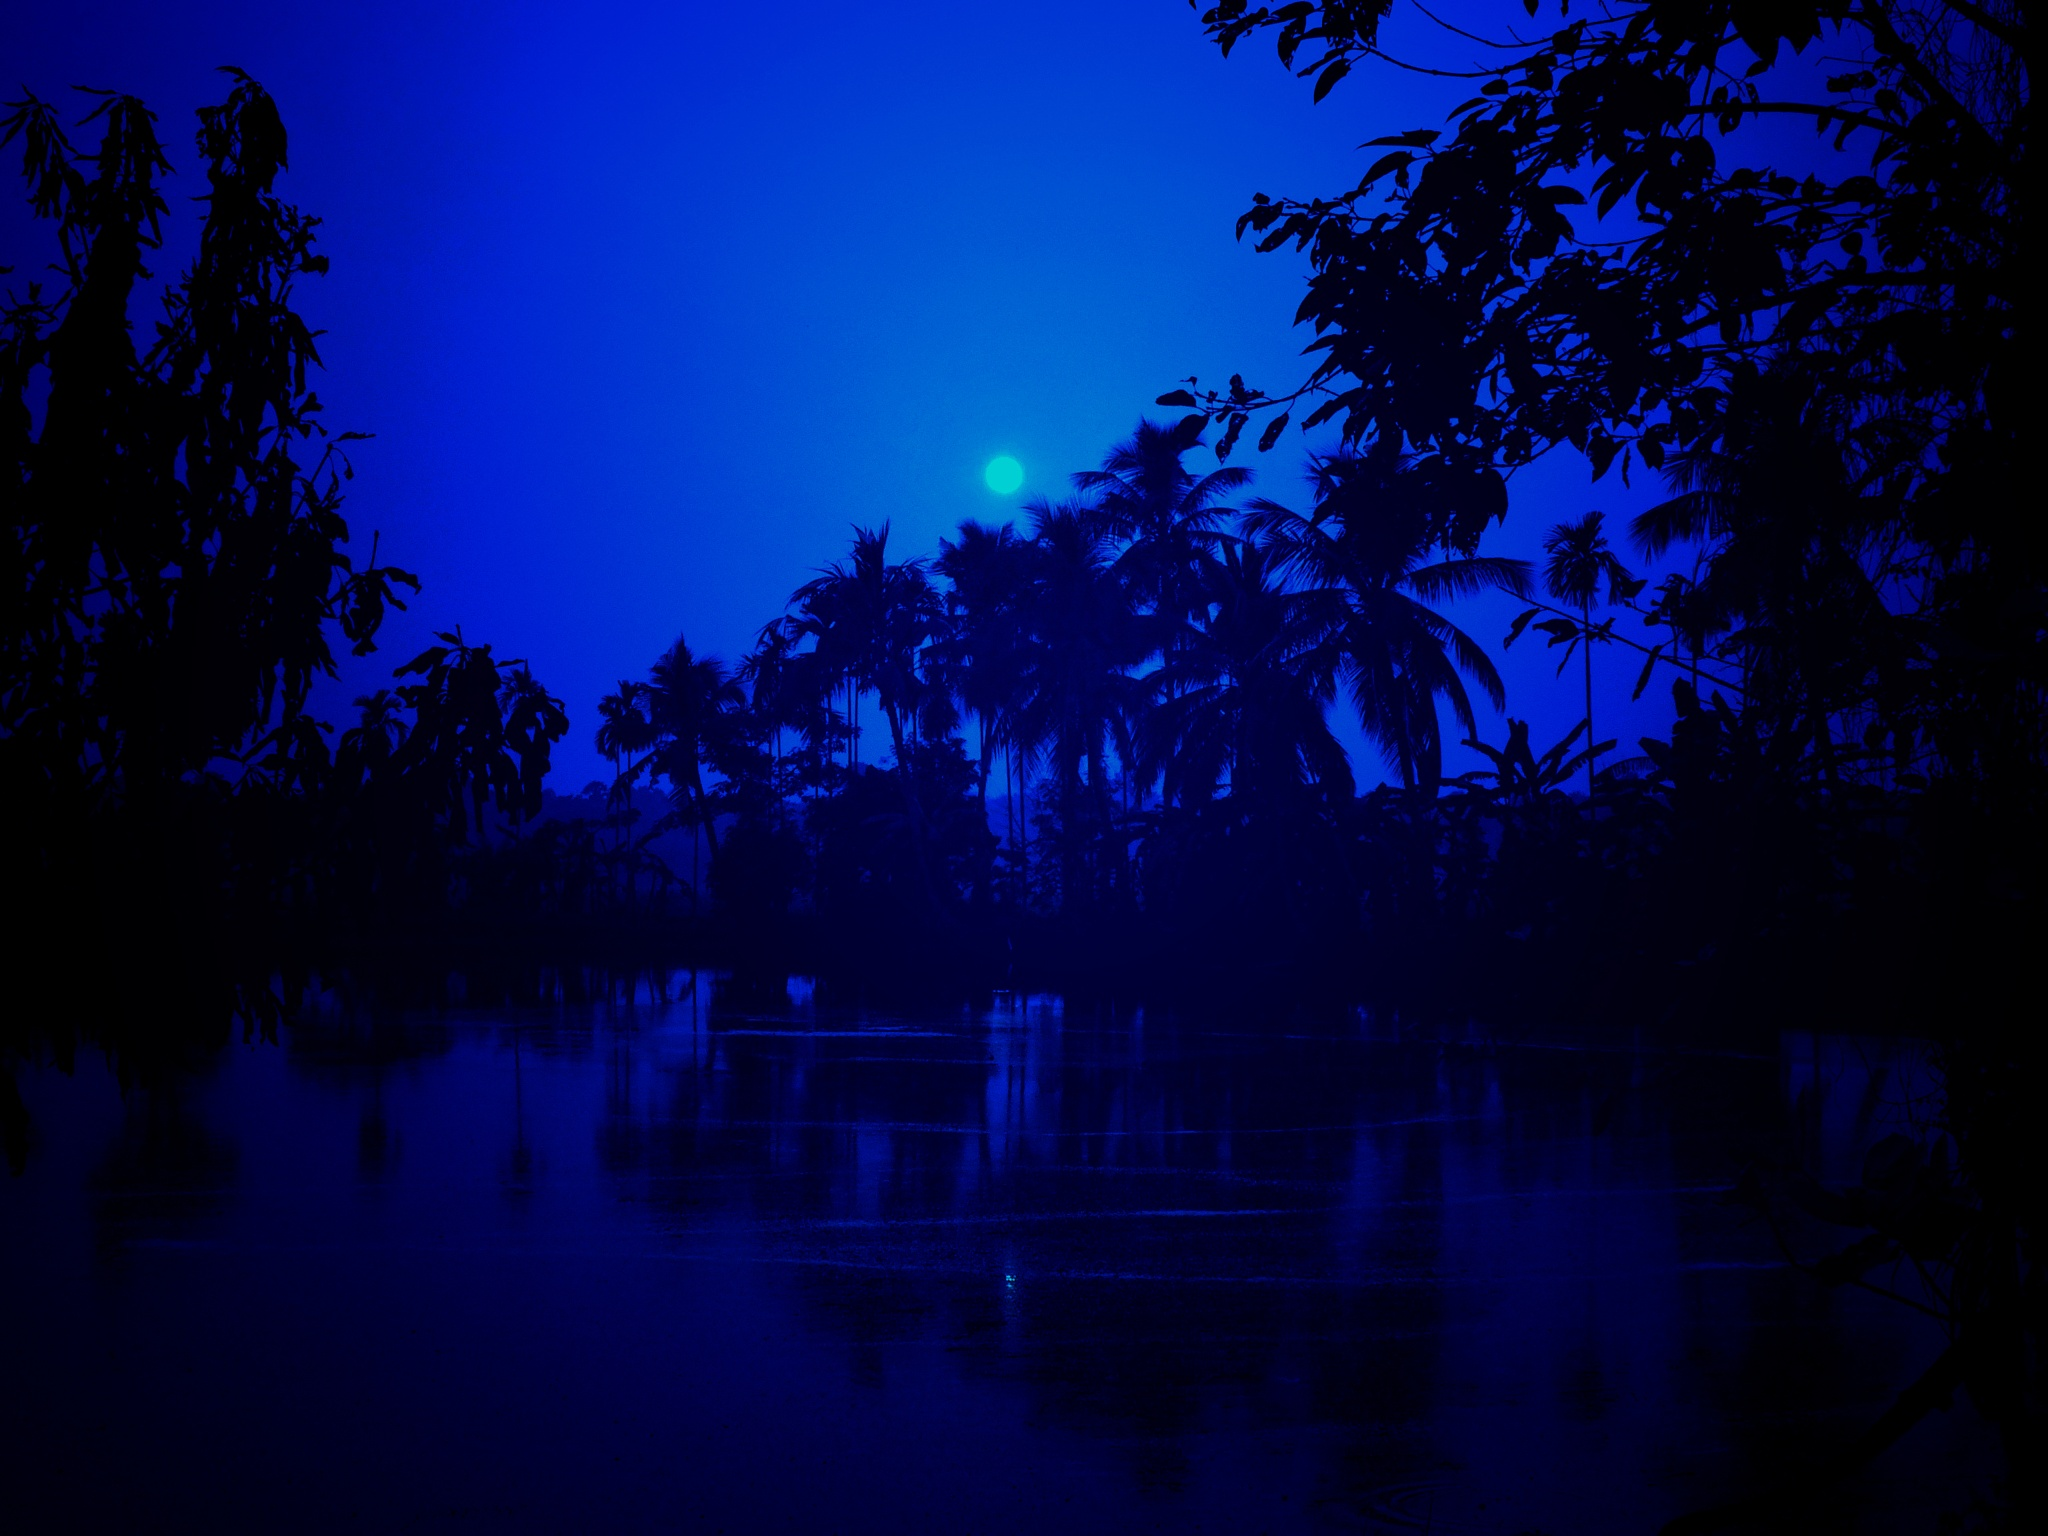 MOoN LiT night by tanay8690